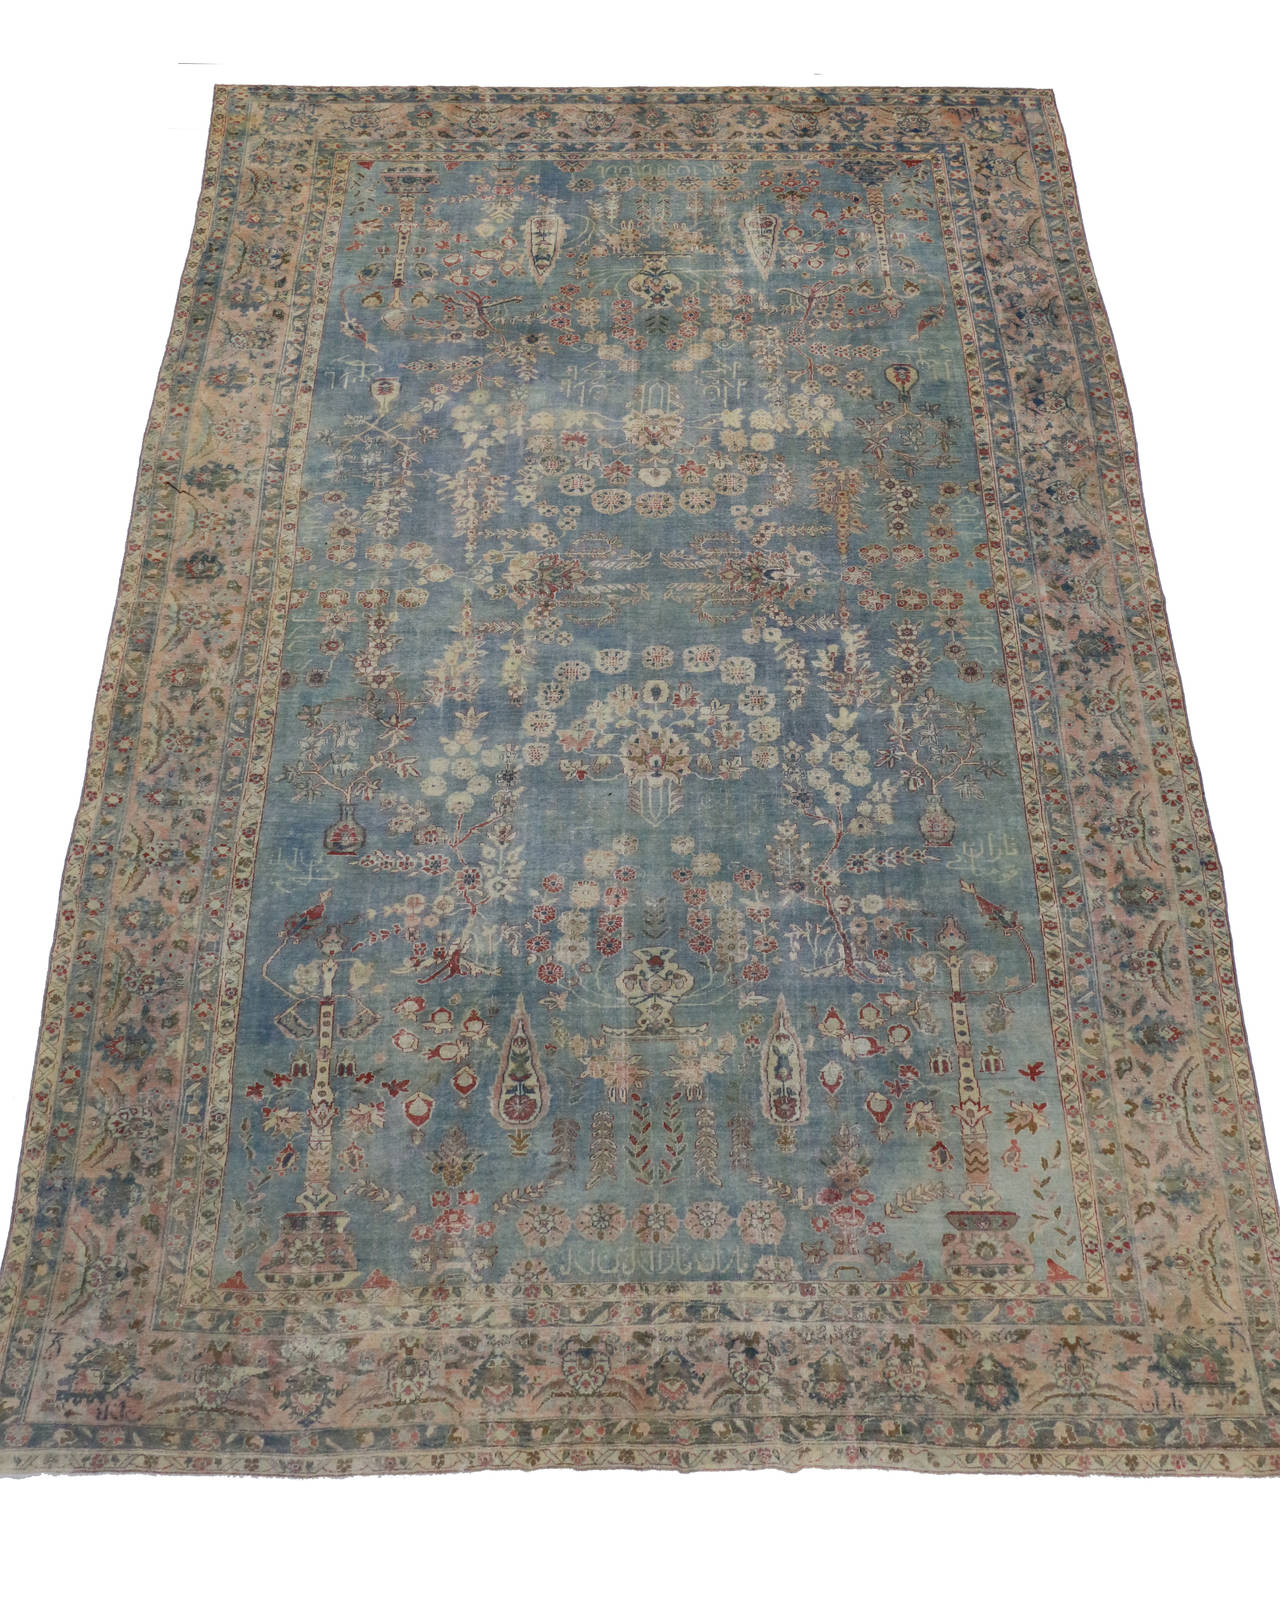 Light Blue Antique Persian Kerman Kirman Distressed Rug